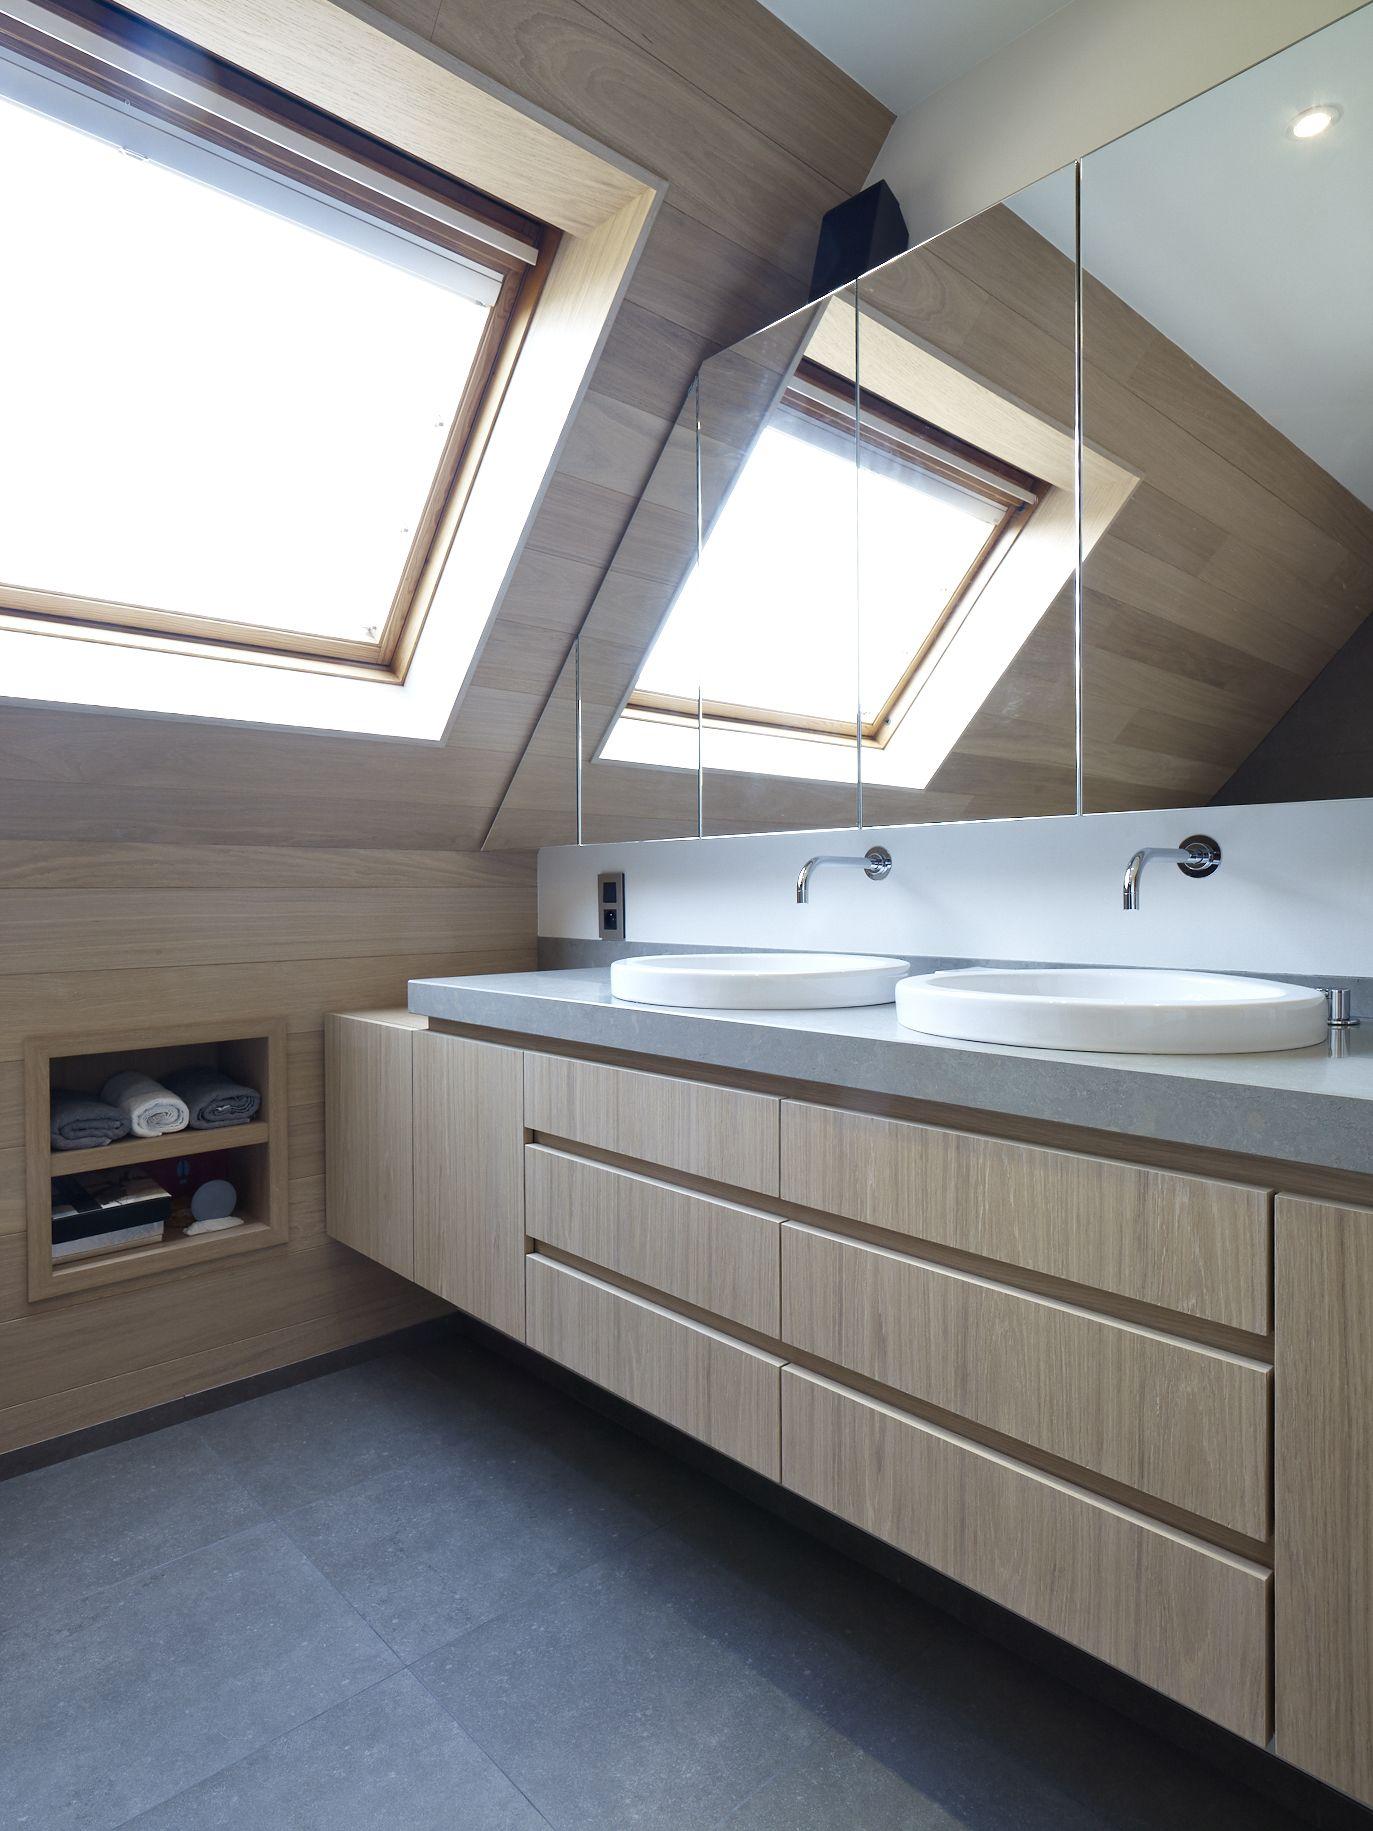 atmosfeer interieur feng shui moorslede. Black Bedroom Furniture Sets. Home Design Ideas